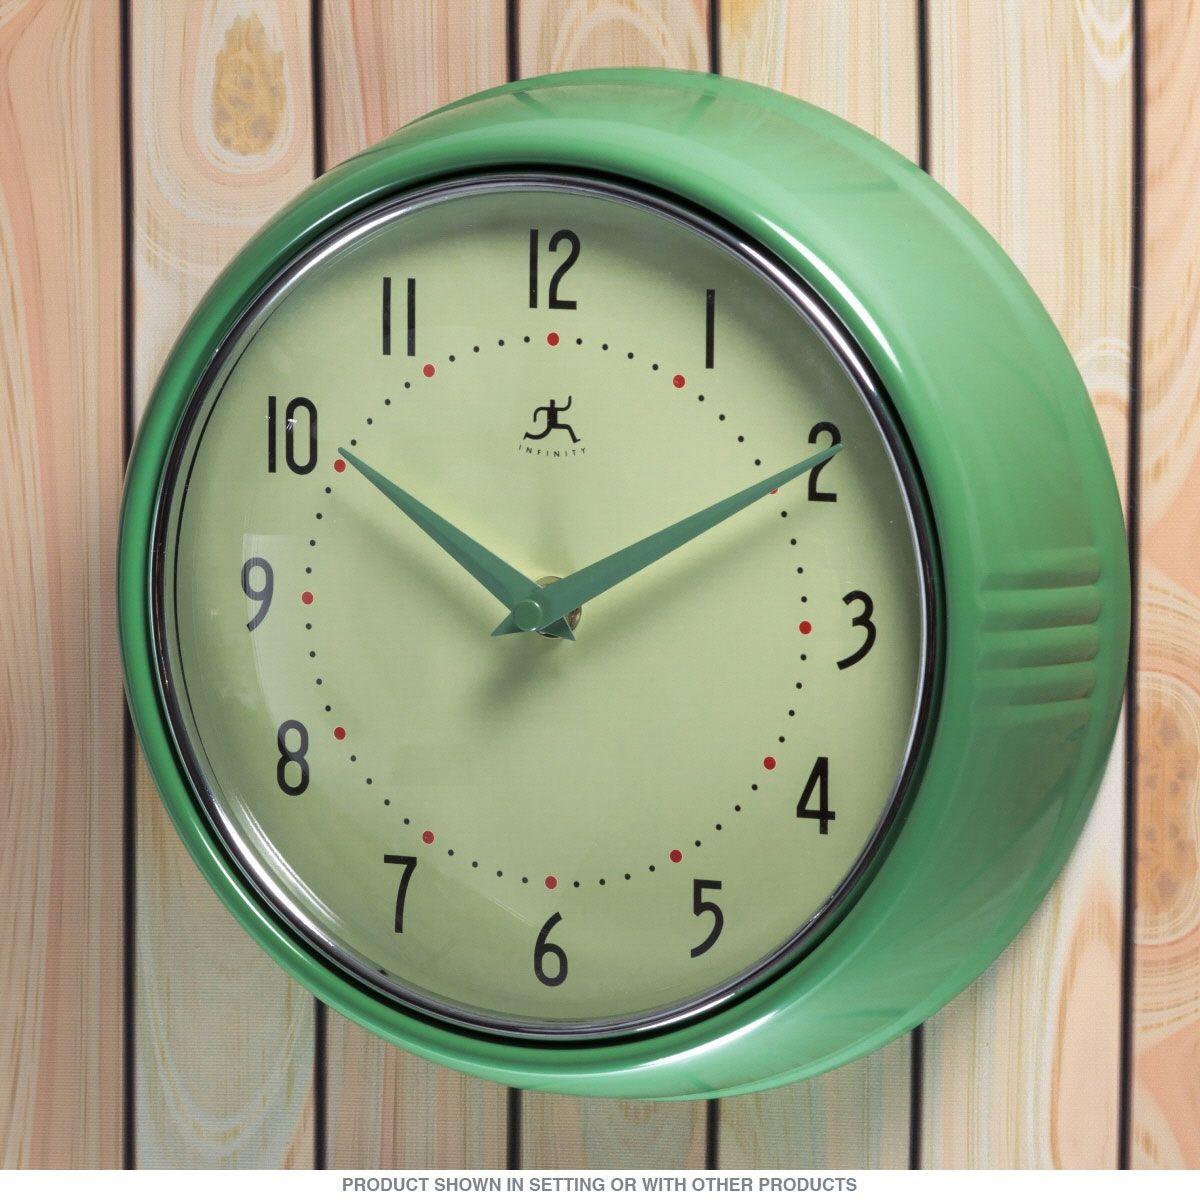 Vintage Looking Kitchen Wall Clocks Httpbleeckerstreetbeat